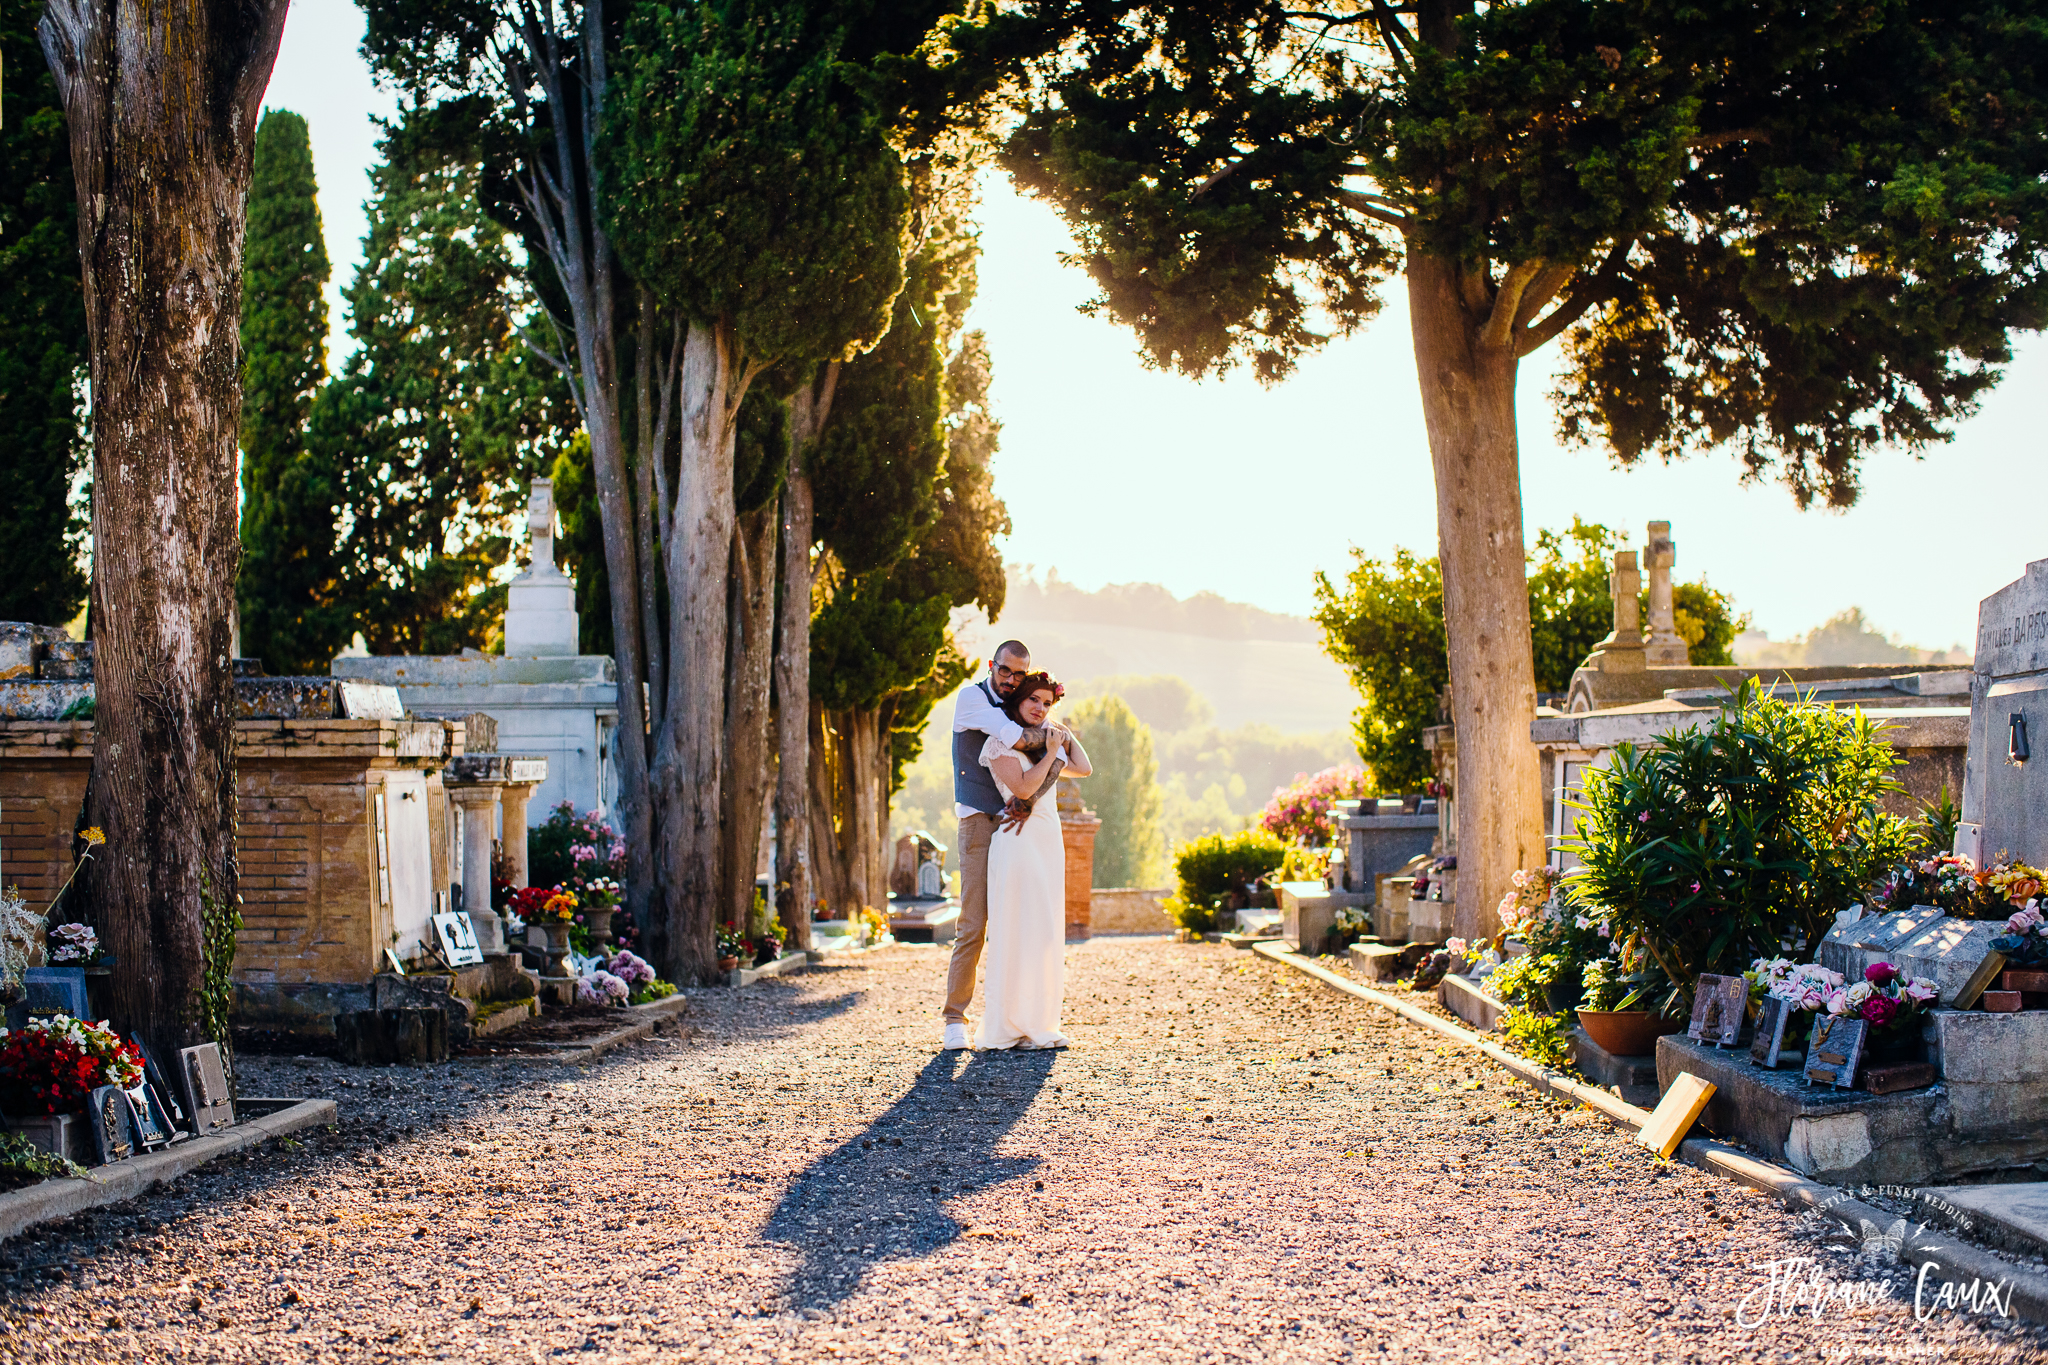 photographe-mariage-toulouse-rocknroll-maries-tatoues-floriane-caux-57